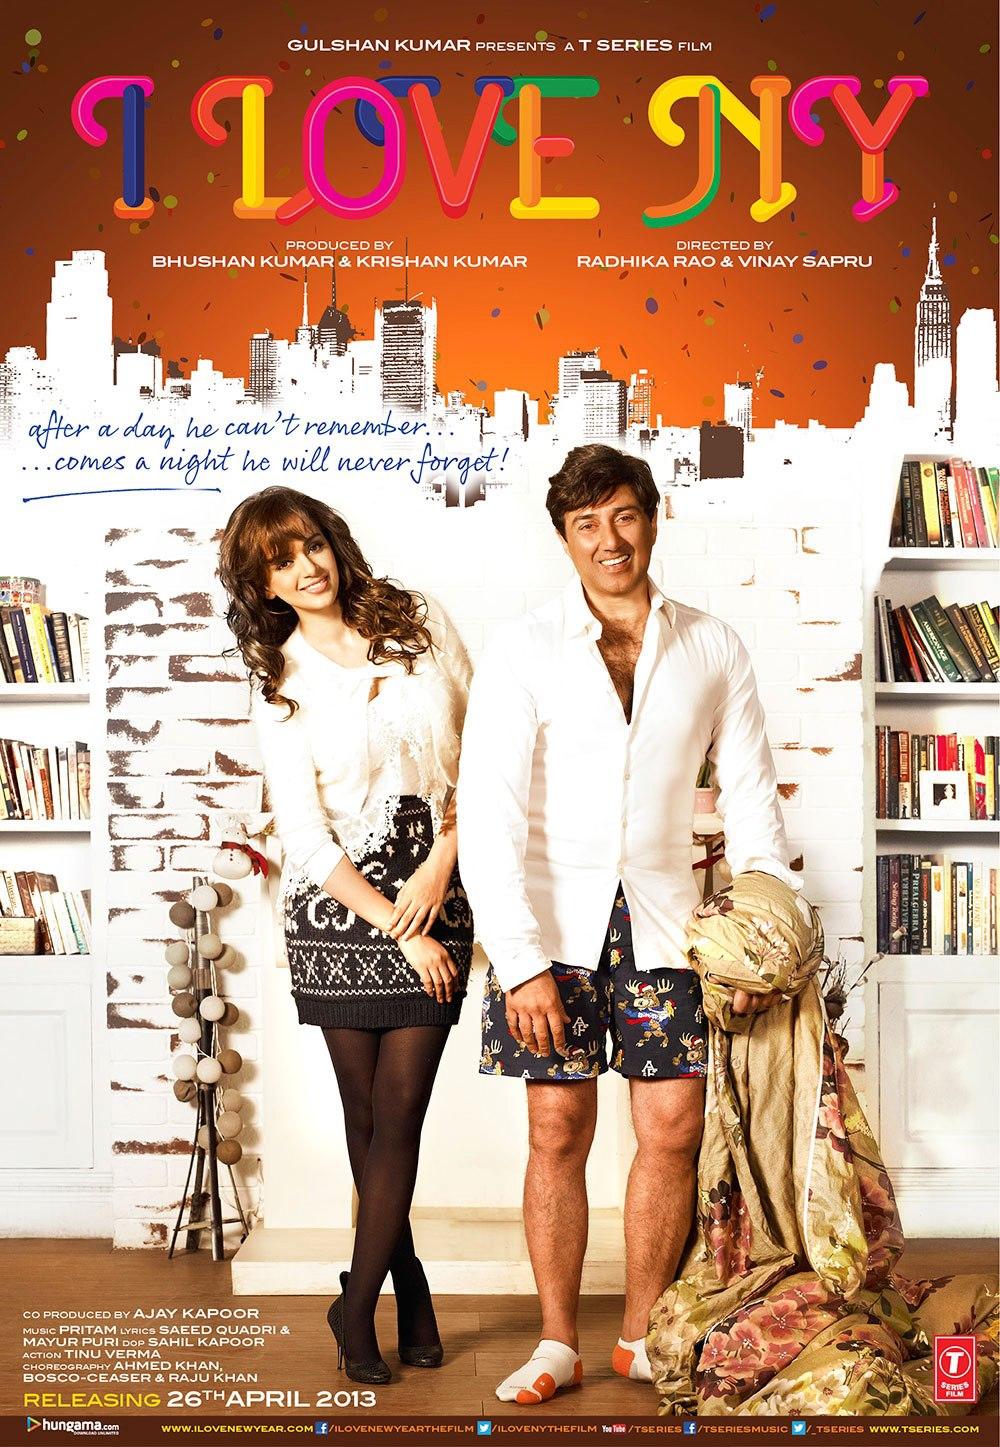 I Love New Year - Movie Poster #1 (Original)